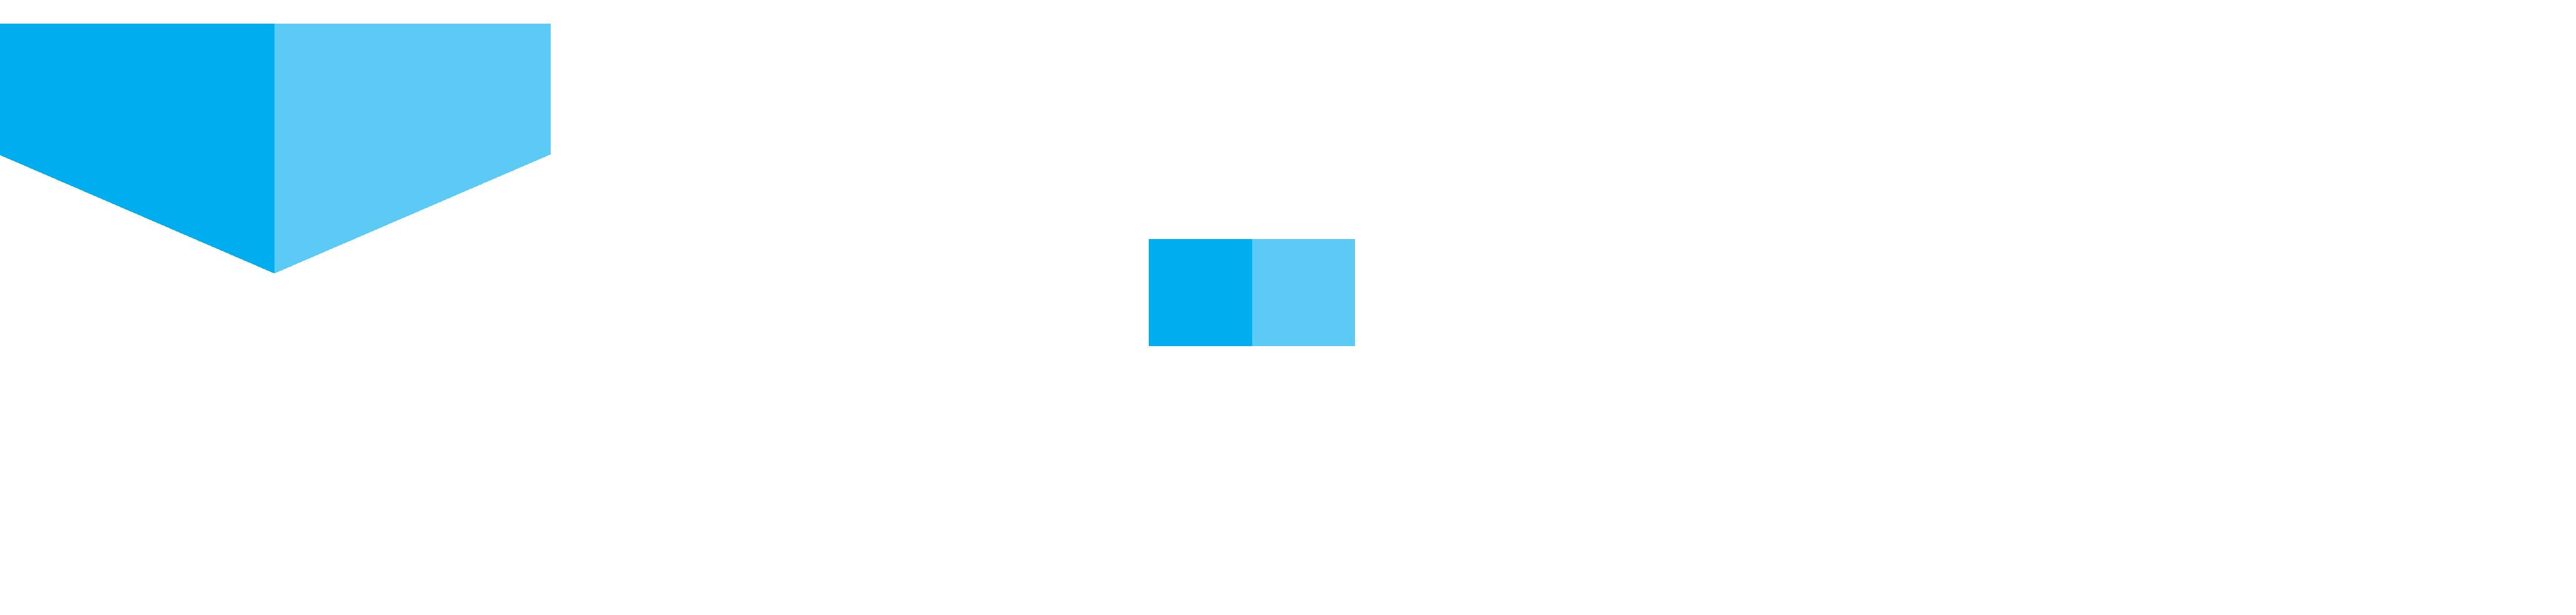 K-TIG Advanced Welding Systems